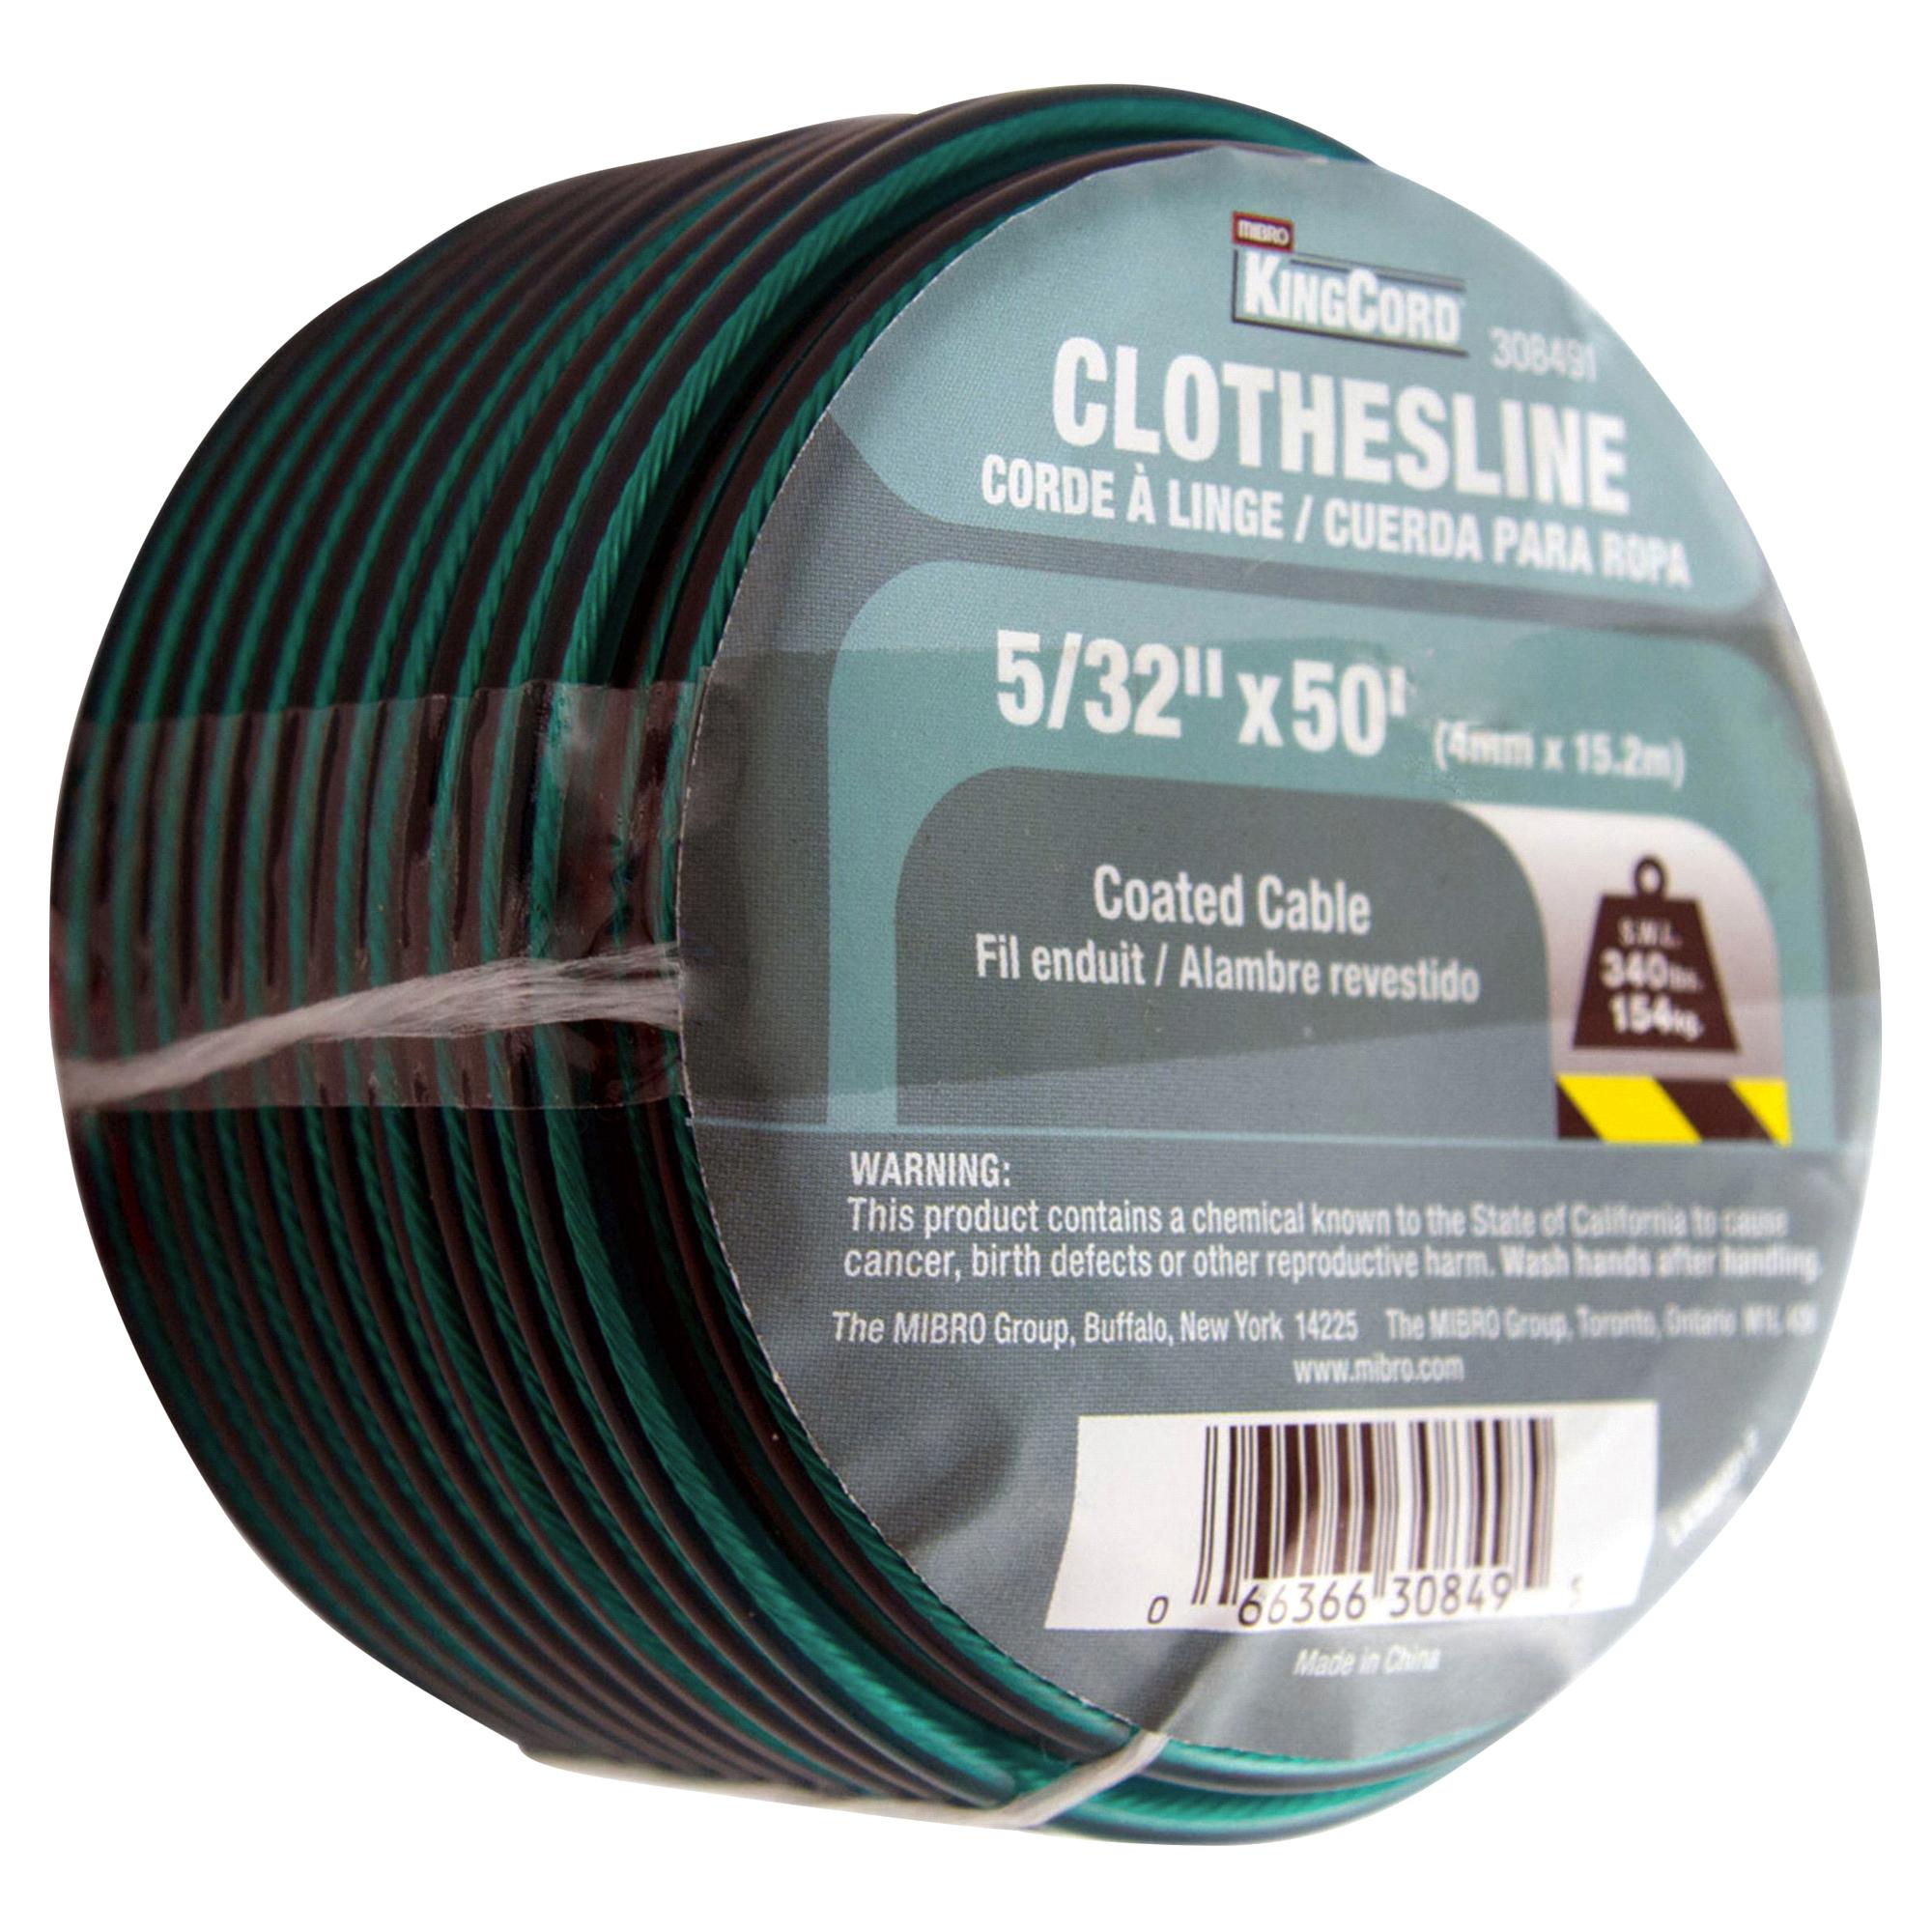 KingCord 5/32 x 50 PVC-Coated Wire Clothesline - Green   Meijer.com